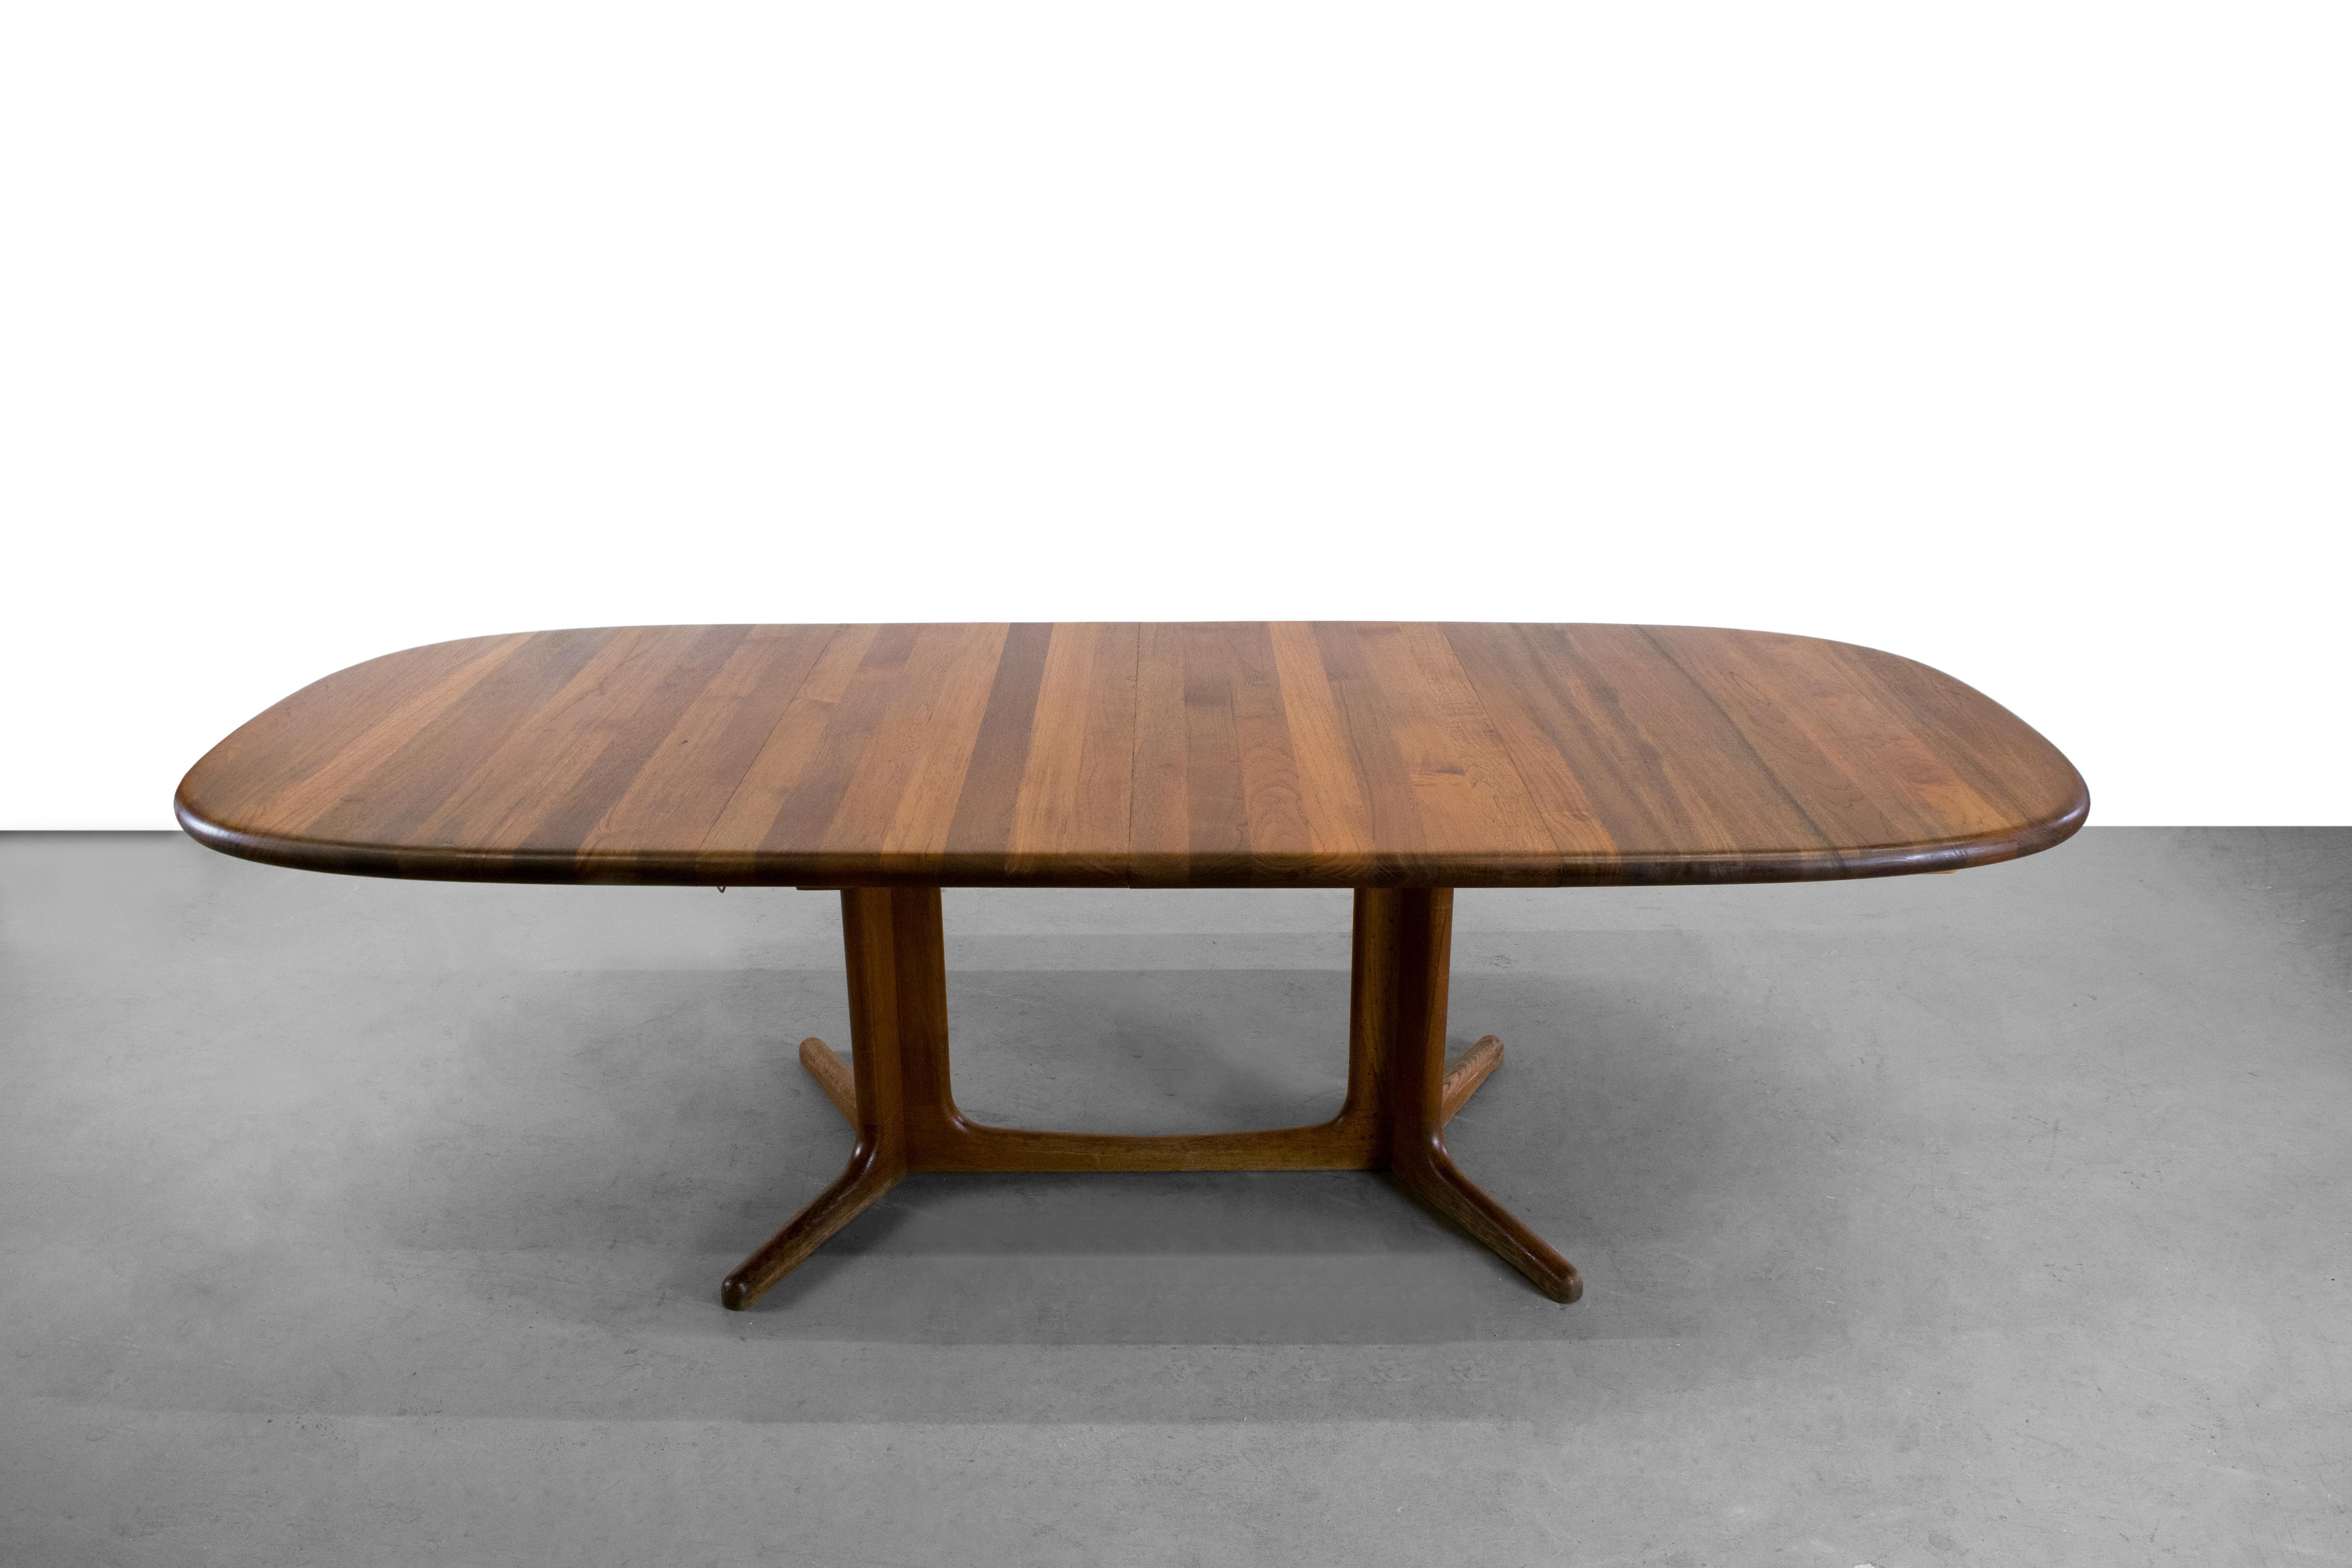 Solid Teak Danish Modern Extension Dining Table Chairish : 74725af7 12a7 4e6b b04a a4fe61b249f2aspectfitampwidth640ampheight640 from www.chairish.com size 640 x 640 jpeg 21kB